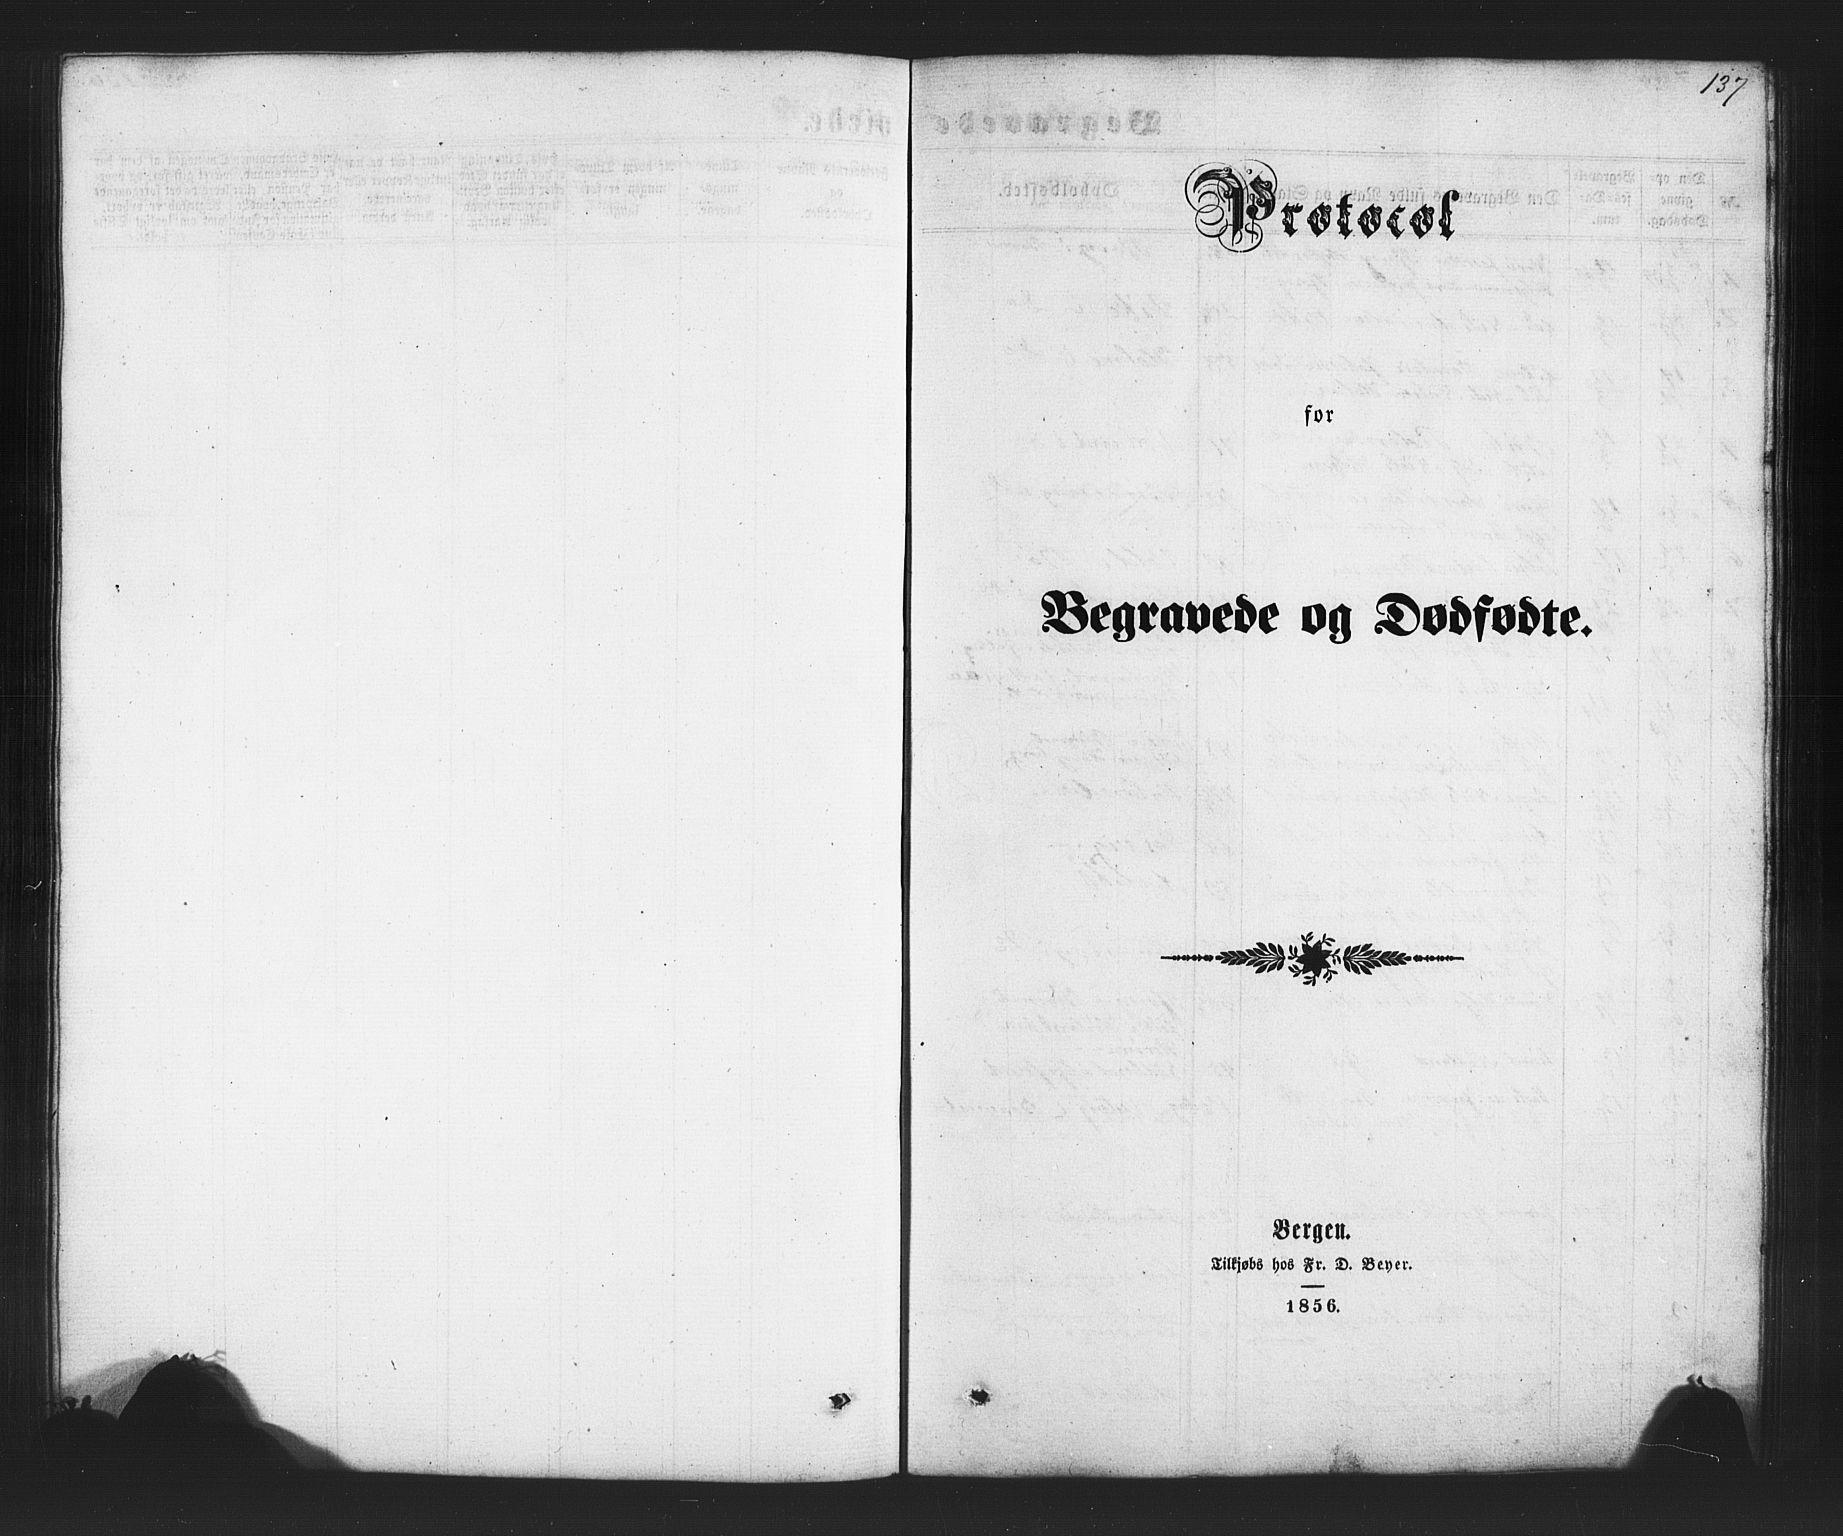 SAB, Finnås sokneprestembete, H/Ha/Hab/Habc/L0001: Klokkerbok nr. C 1, 1860-1887, s. 137